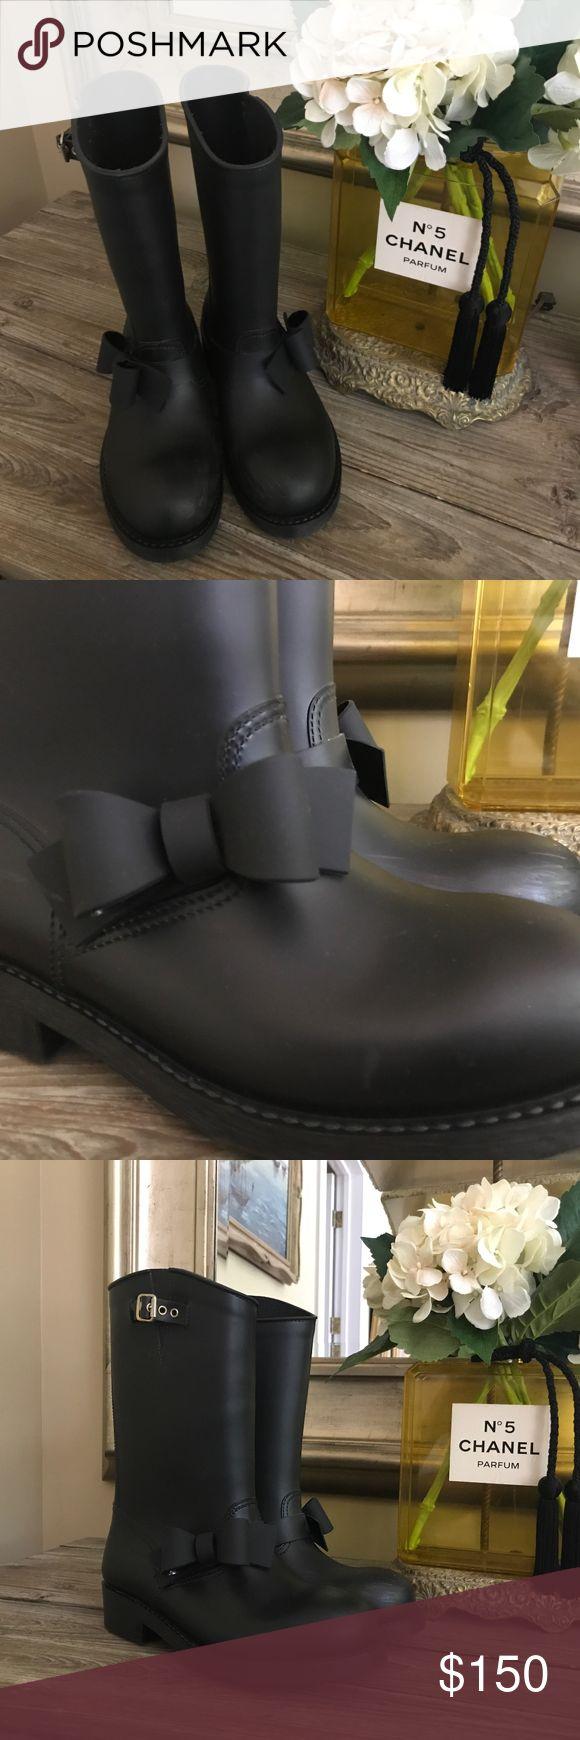 Black Valentino Rain Boots Valentino Pink Label rain boots. Some scuffs. Size 41 but fits more like a 9/9.5 Valentino Shoes Winter & Rain Boots